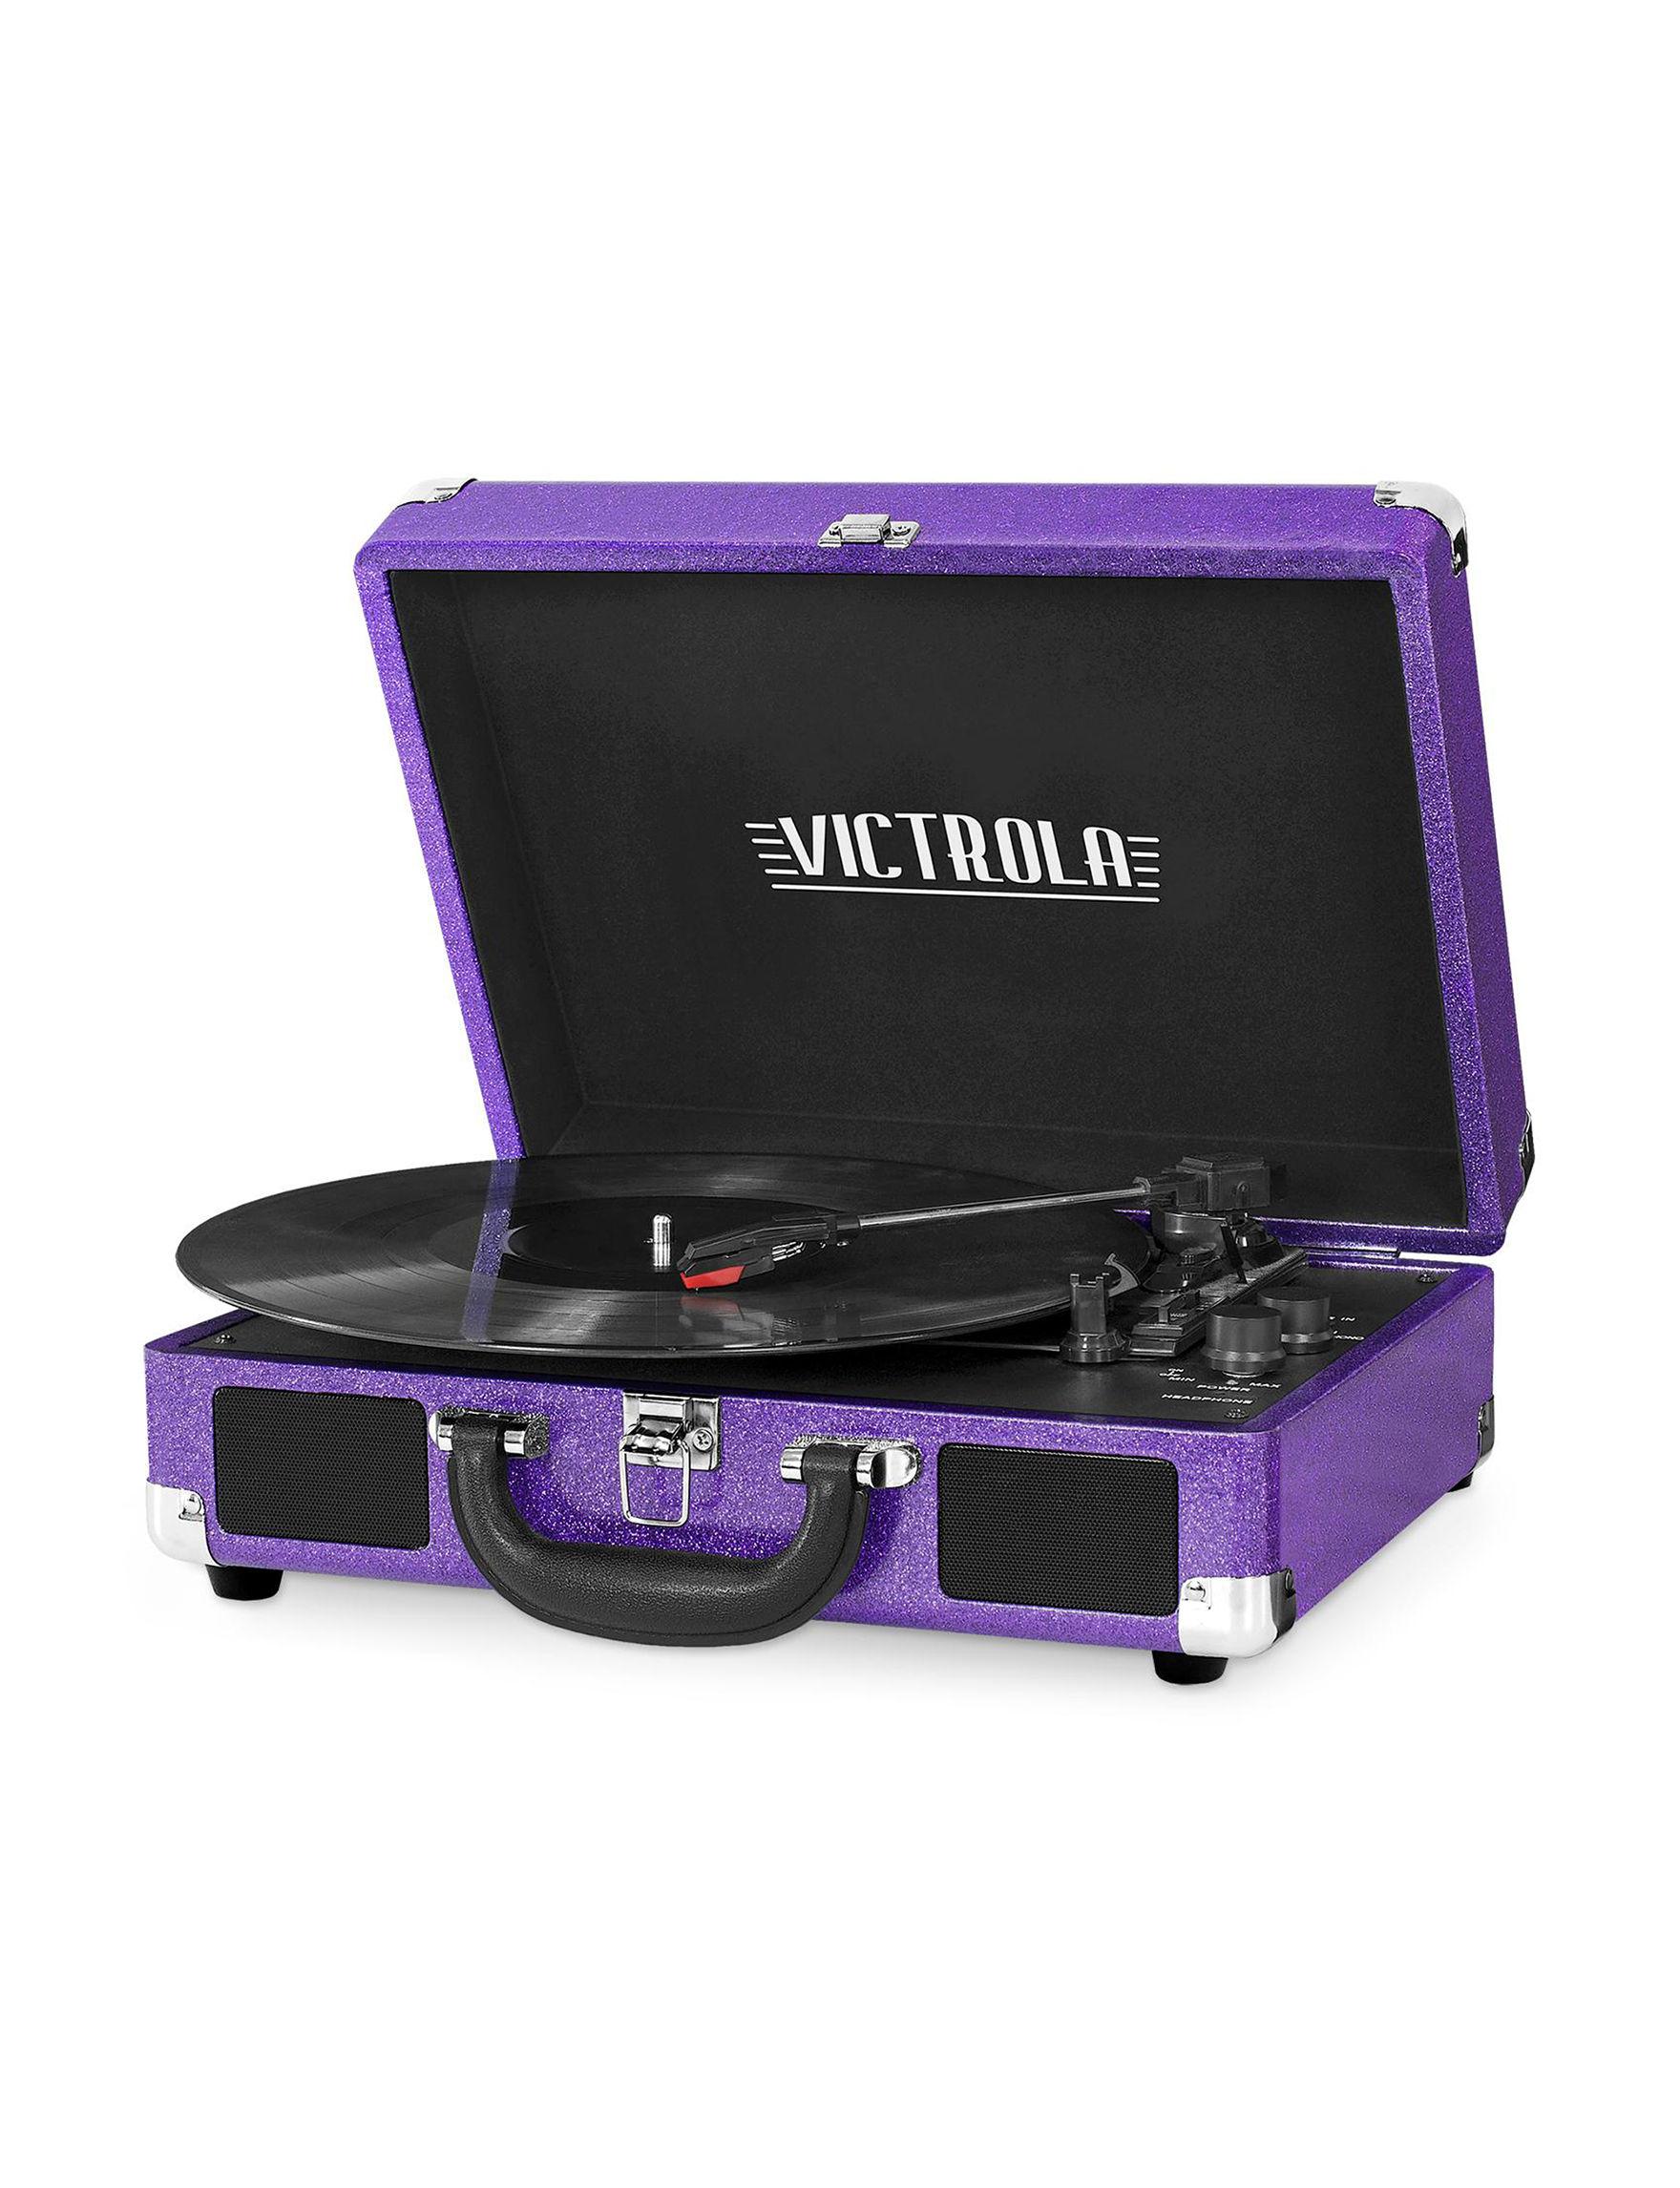 Victrola  Turntables